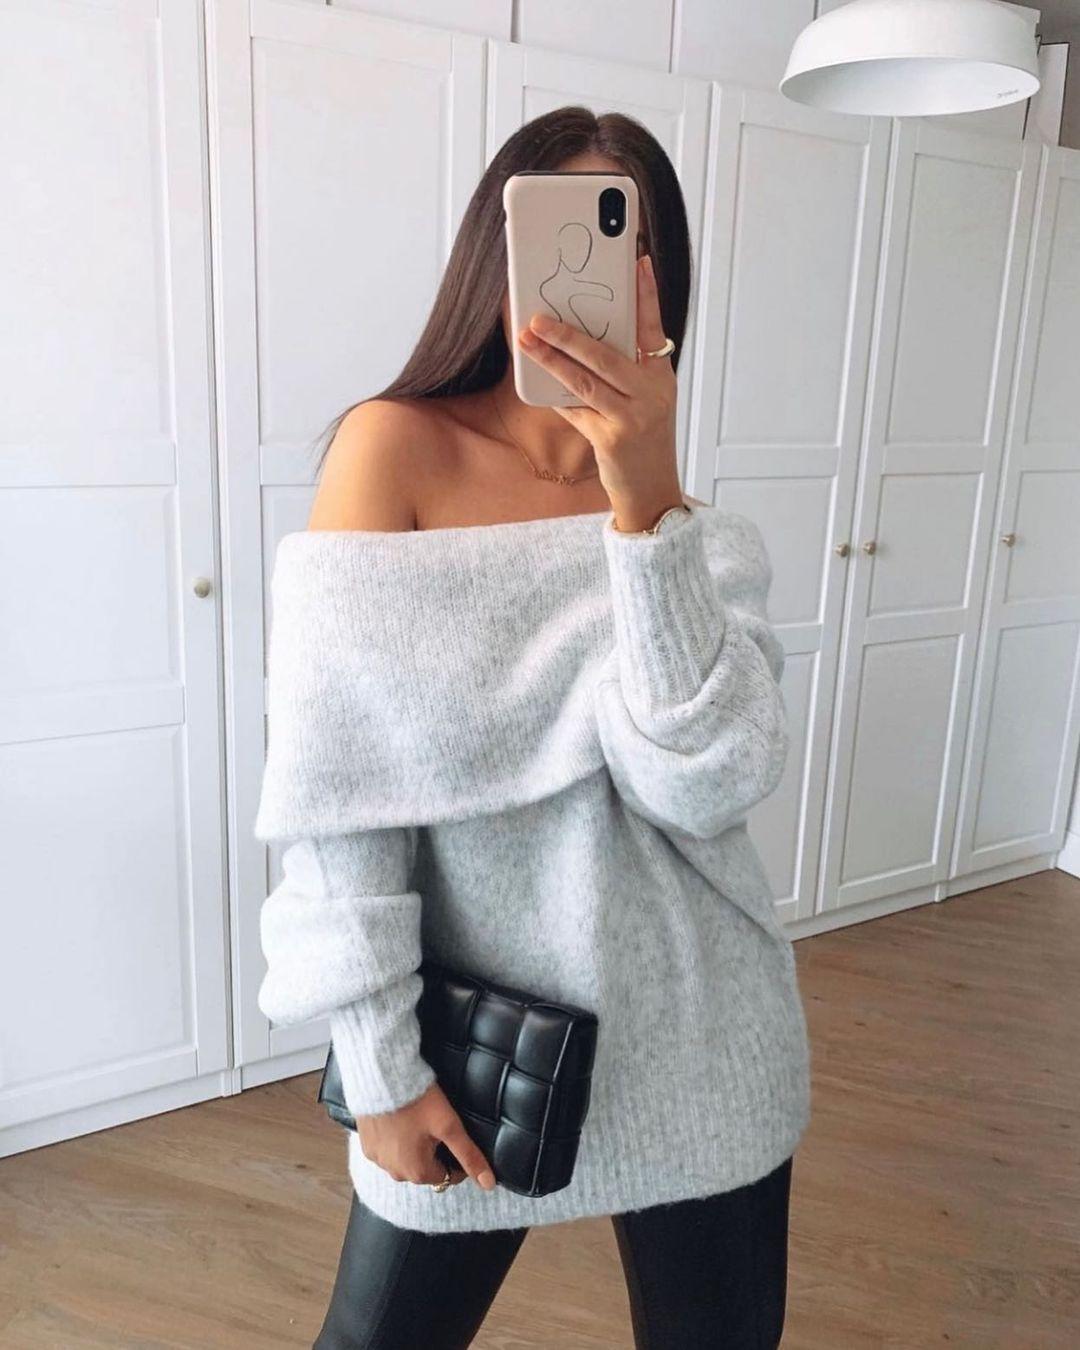 off-the-shoulder jumper de H&M sur hm.addicted